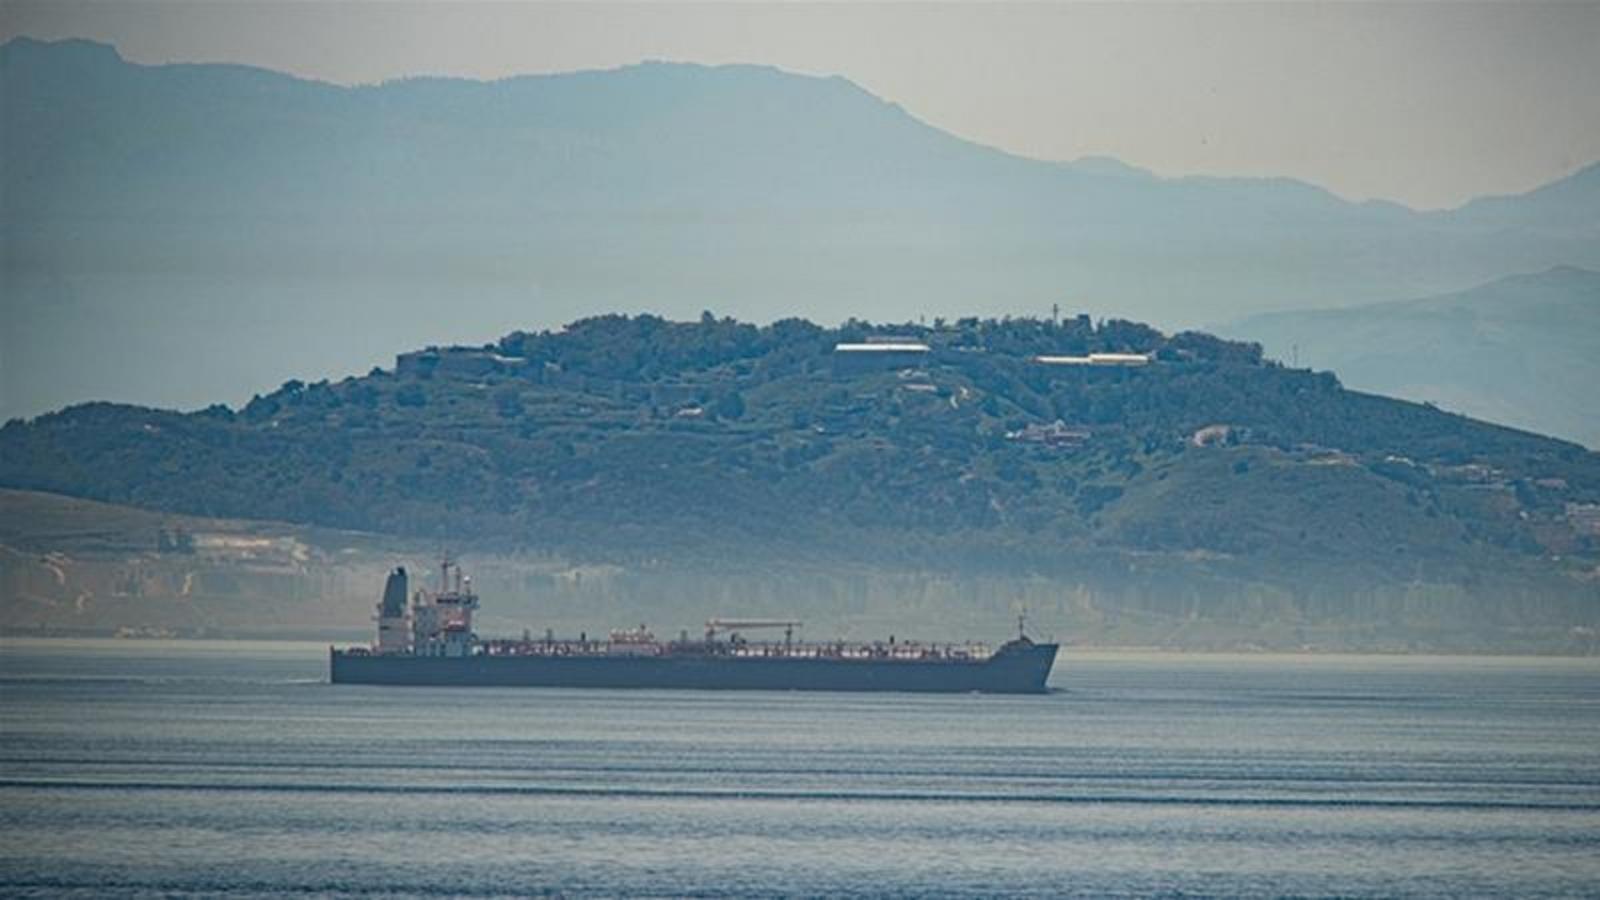 Tàu chở dầu thứ ba của Iran đến Venezuela